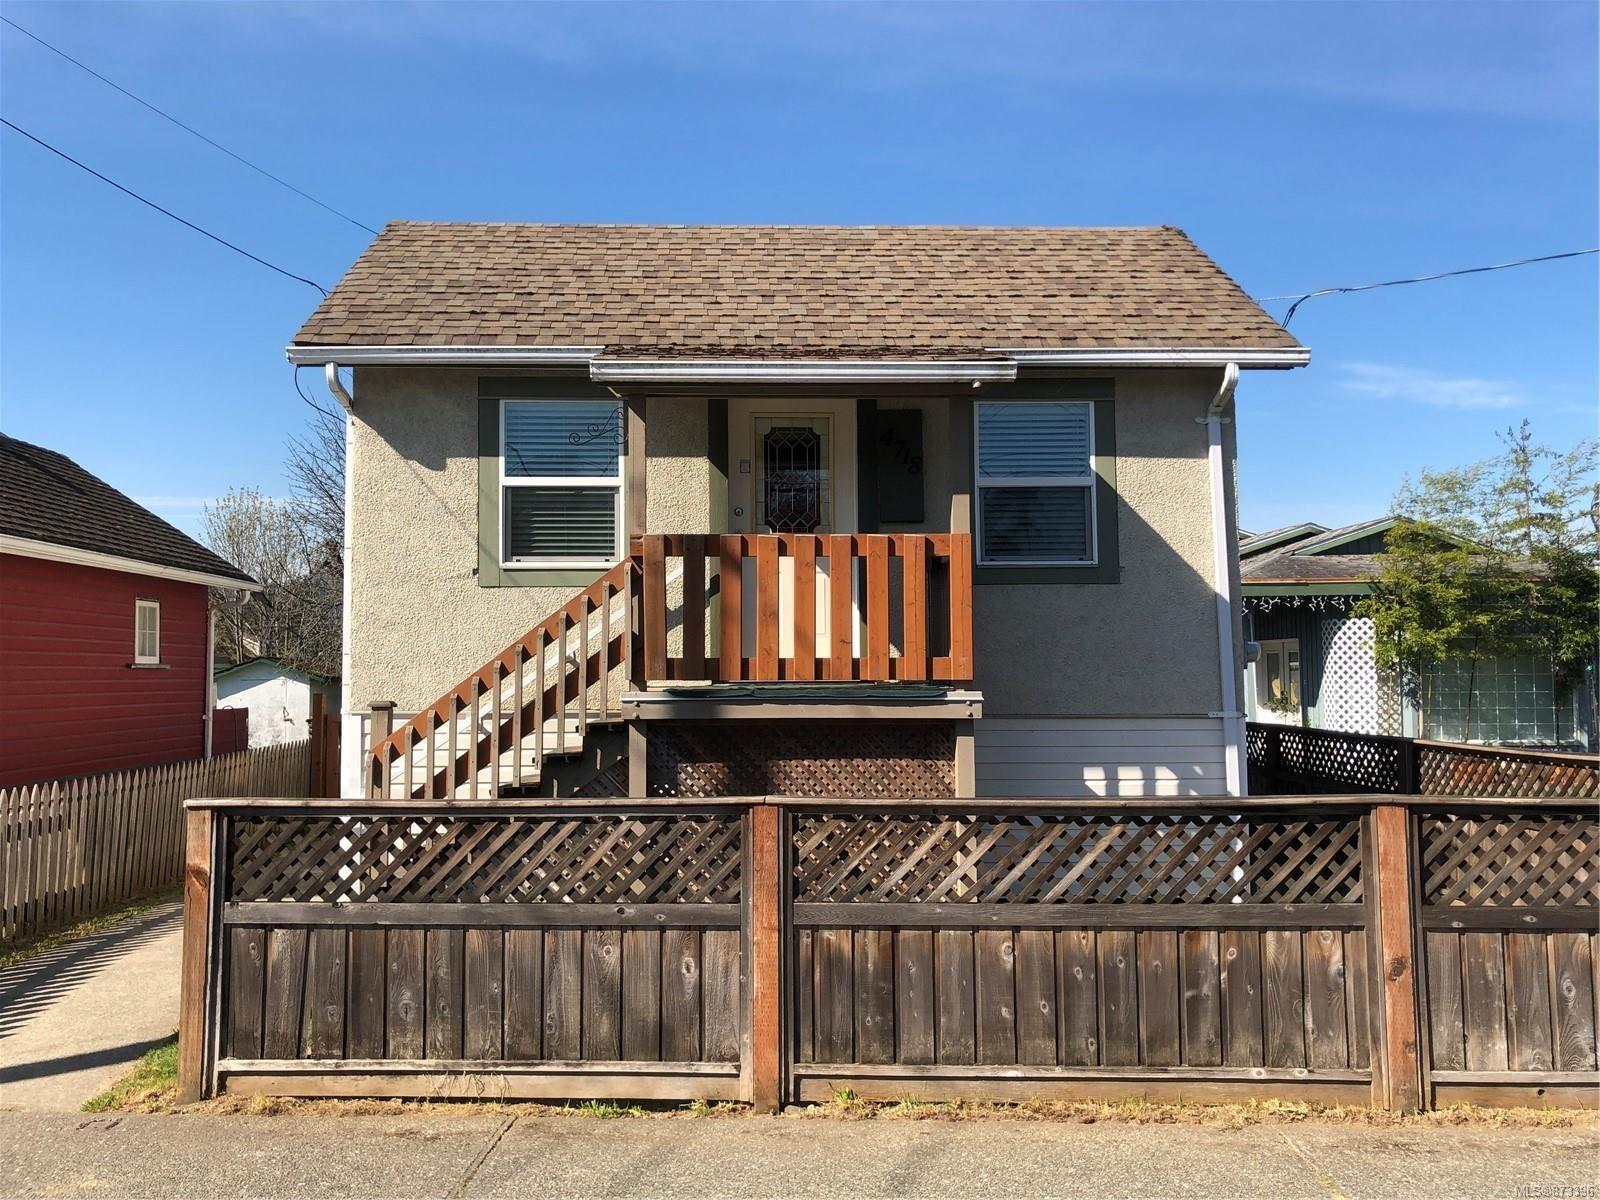 Main Photo: 4718 Gertrude St in : PA Port Alberni House for sale (Port Alberni)  : MLS®# 873396